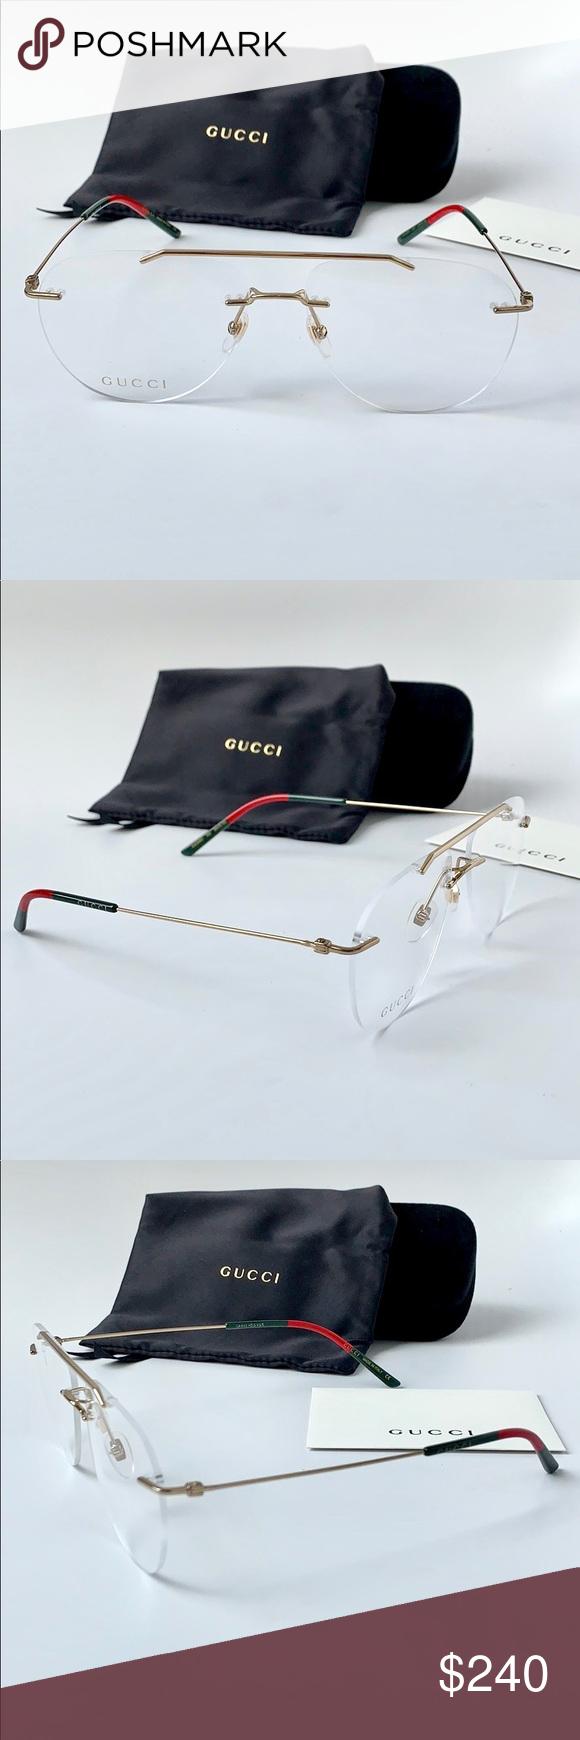 02ff75306d18 Gucci Eyeglasses GG0398O 002 Gold Rimless Optical Gucci Men's Eyeglasses  GG0398O GG/0398/O